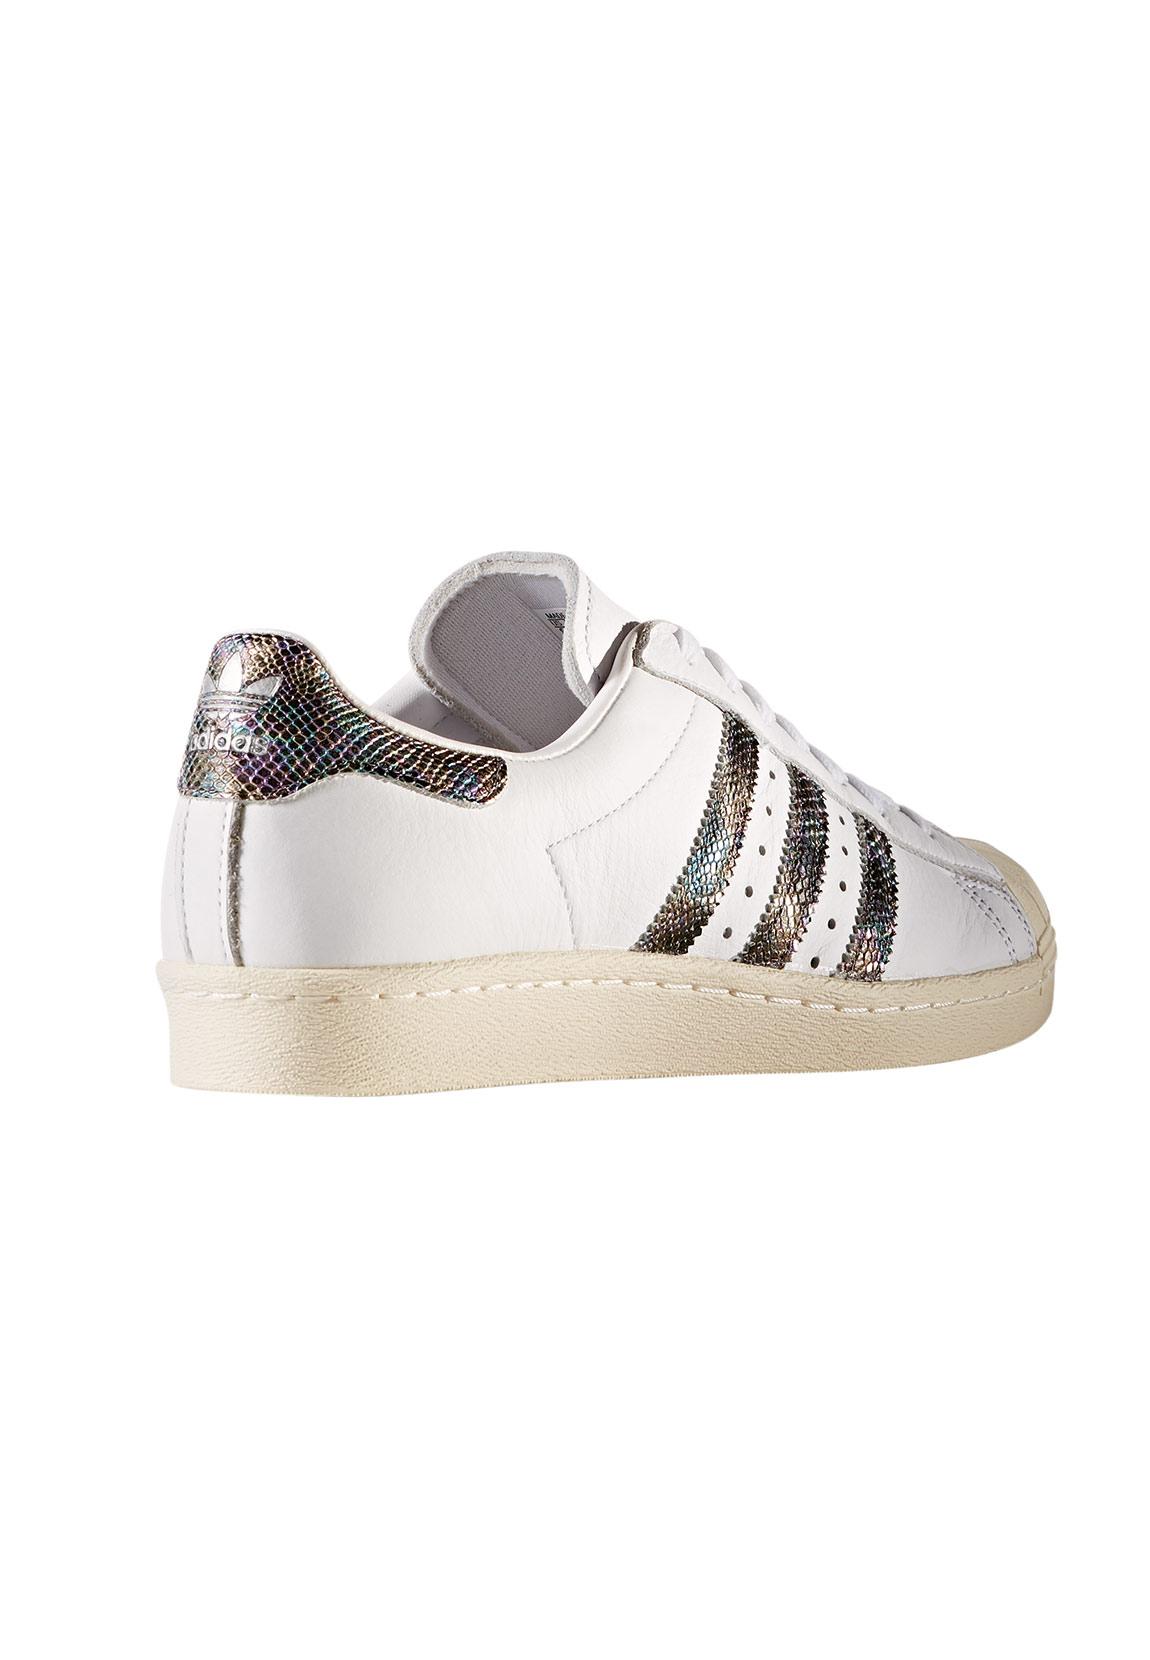 Adidas Sneaker Herren SUPERSTAR 80S BZ0148 Weiß